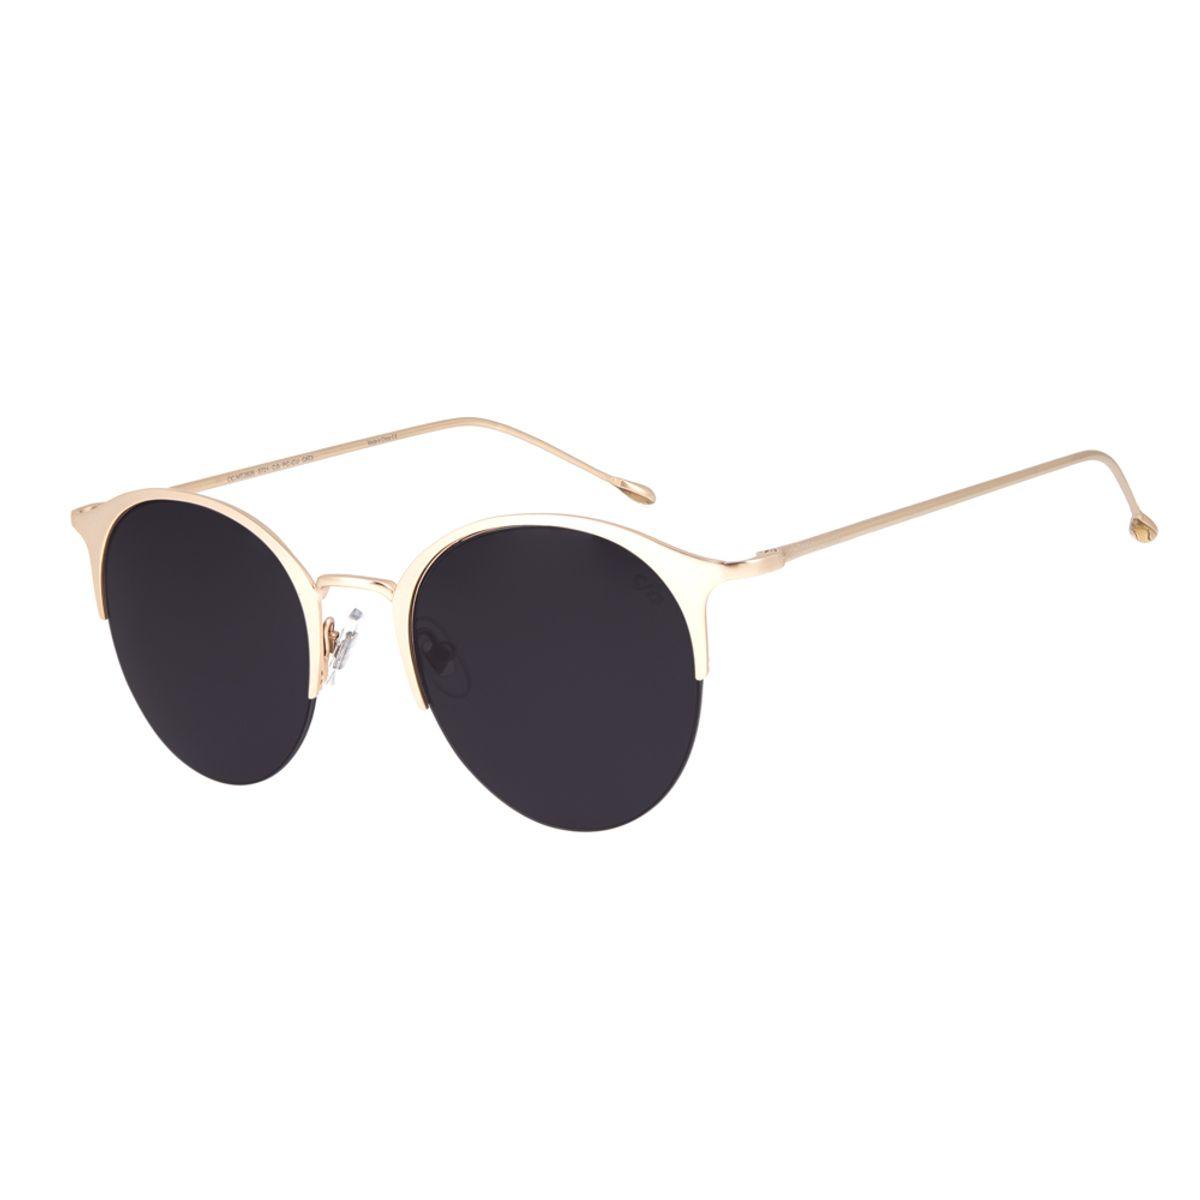 454ebcaf4e7dd Óculos de Sol Chilli Beans Feminino Jazz Redondo Arte de Rua Cranio ...